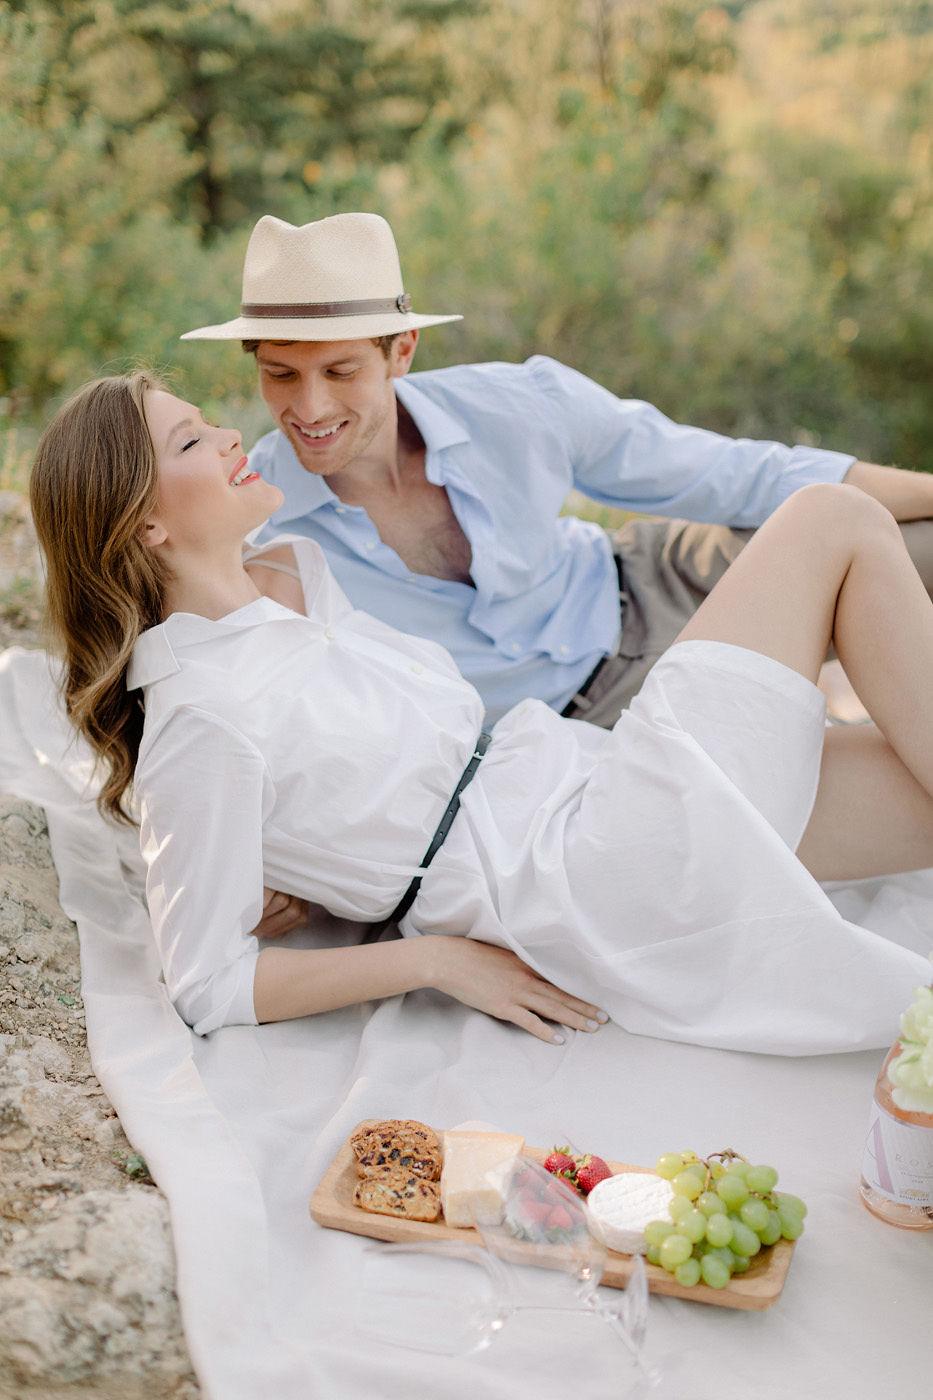 Wedding Proposal In Athens - Picnic